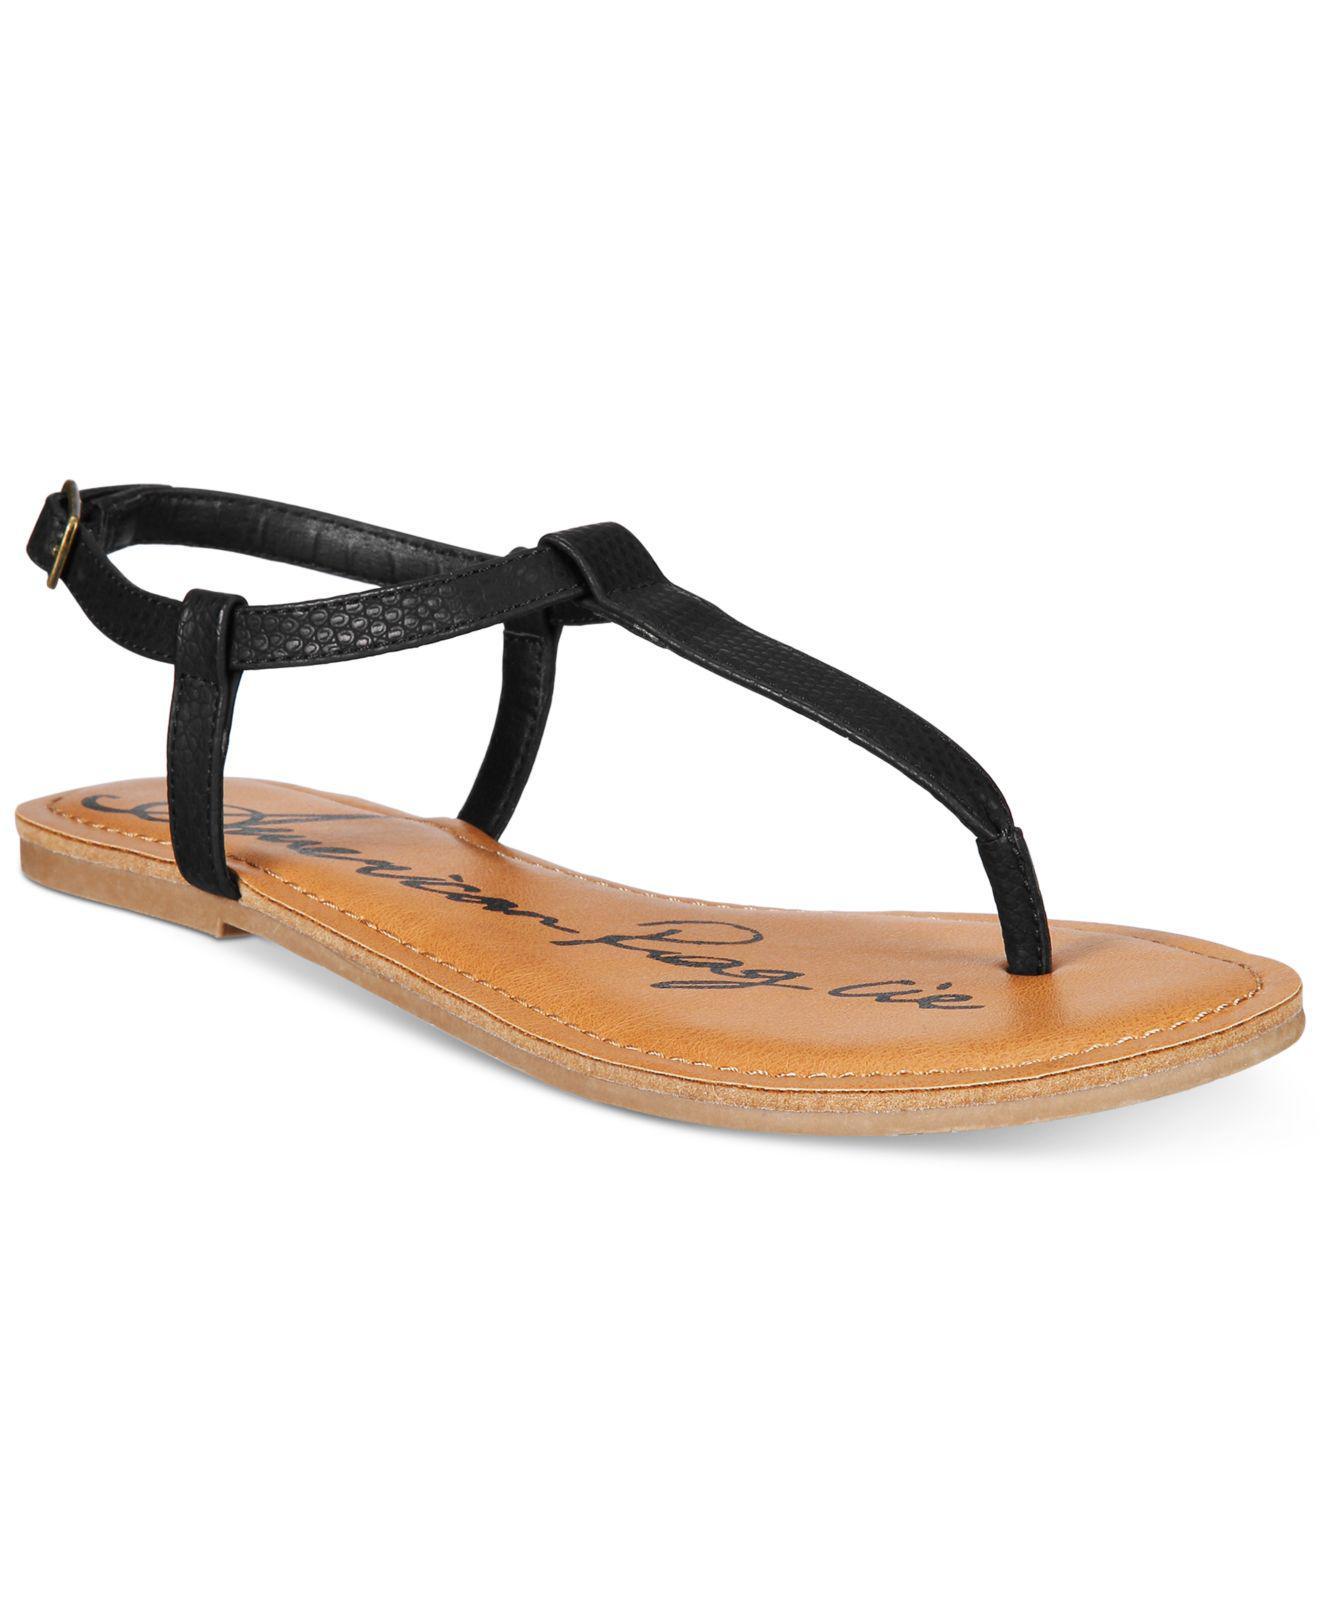 95b66333a9154 Lyst - American Rag Krista T-strap Flat Sandals in Brown